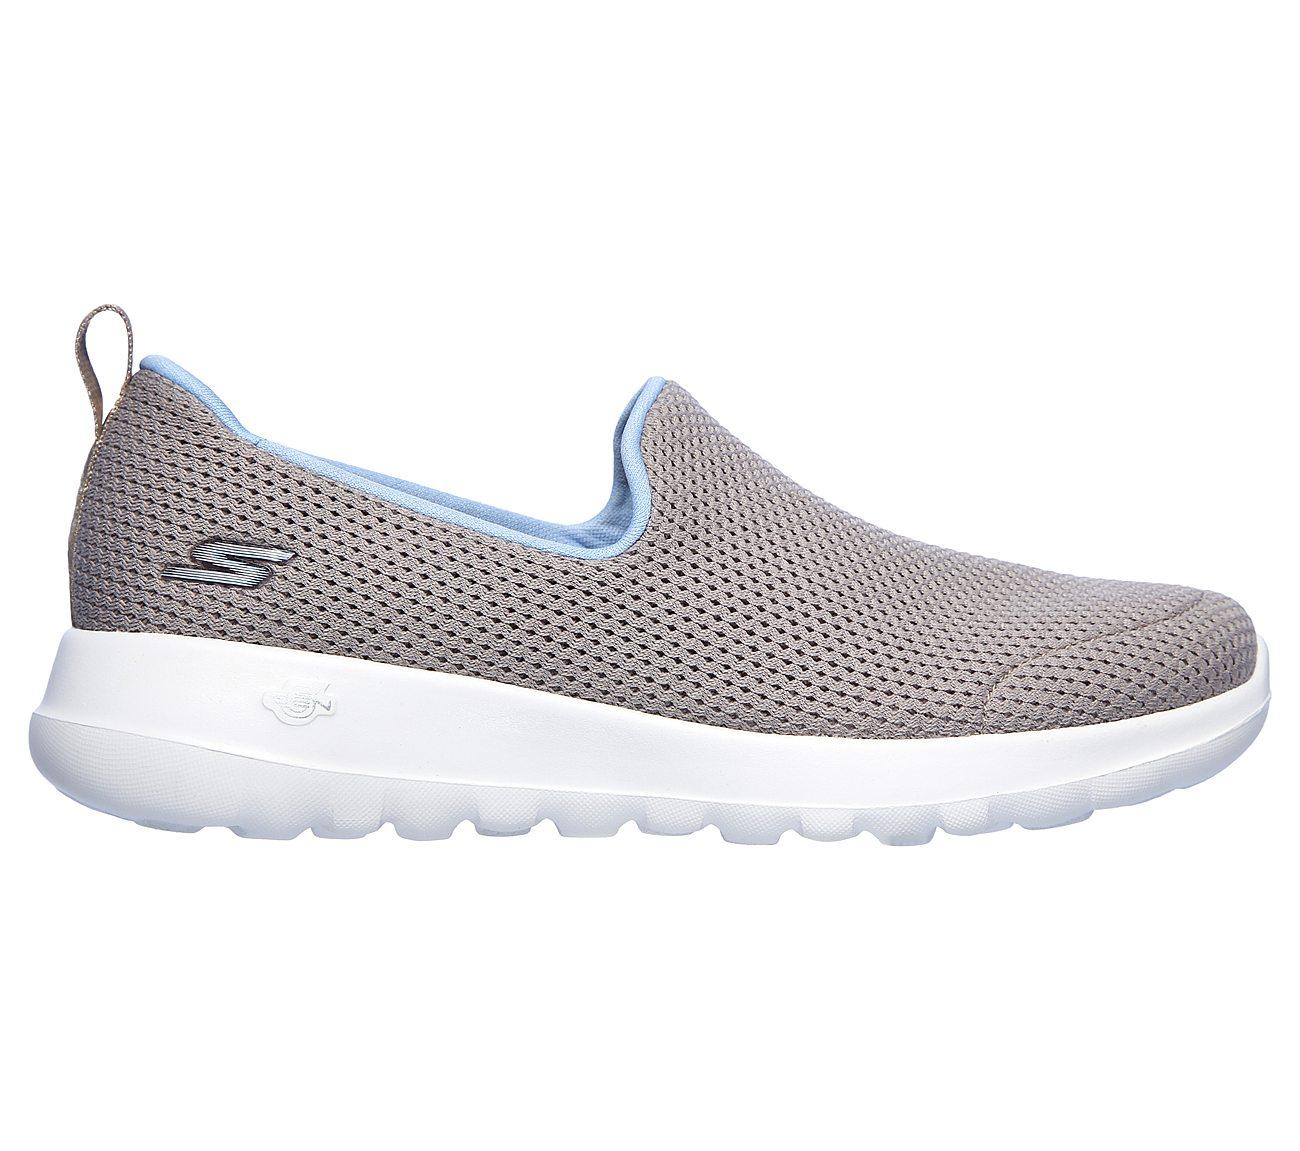 Buy SKECHERS Skechers GOwalk Joy - Admirable Skechers Performance Shoes